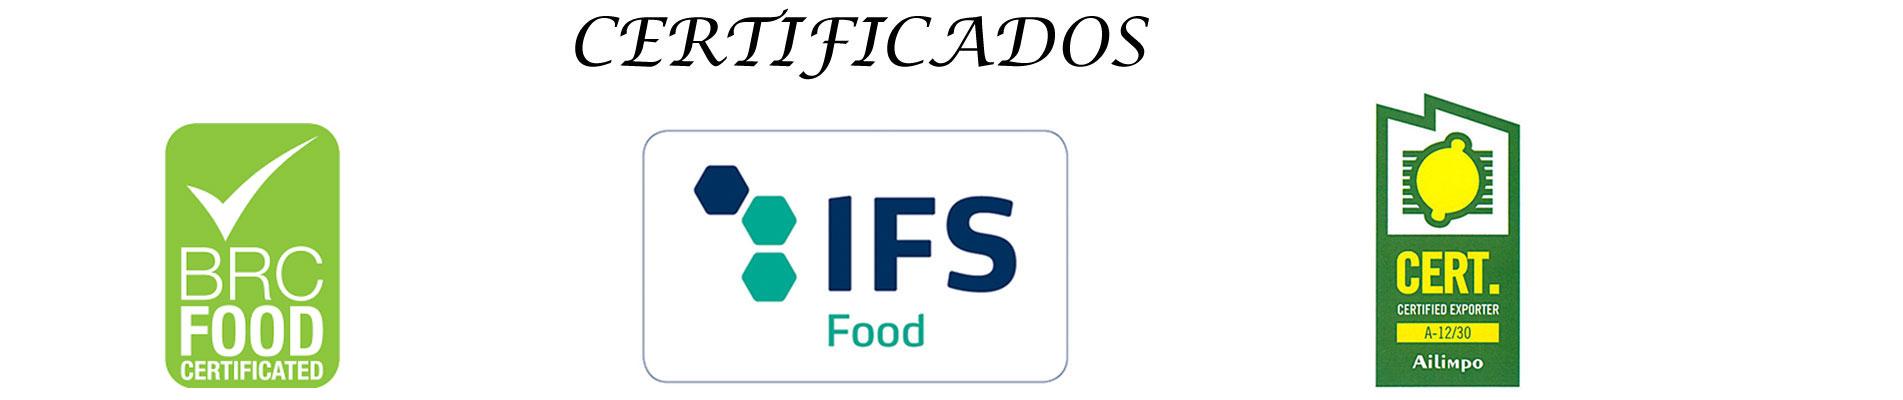 CERTIFICADOS-WEB-APEMAR